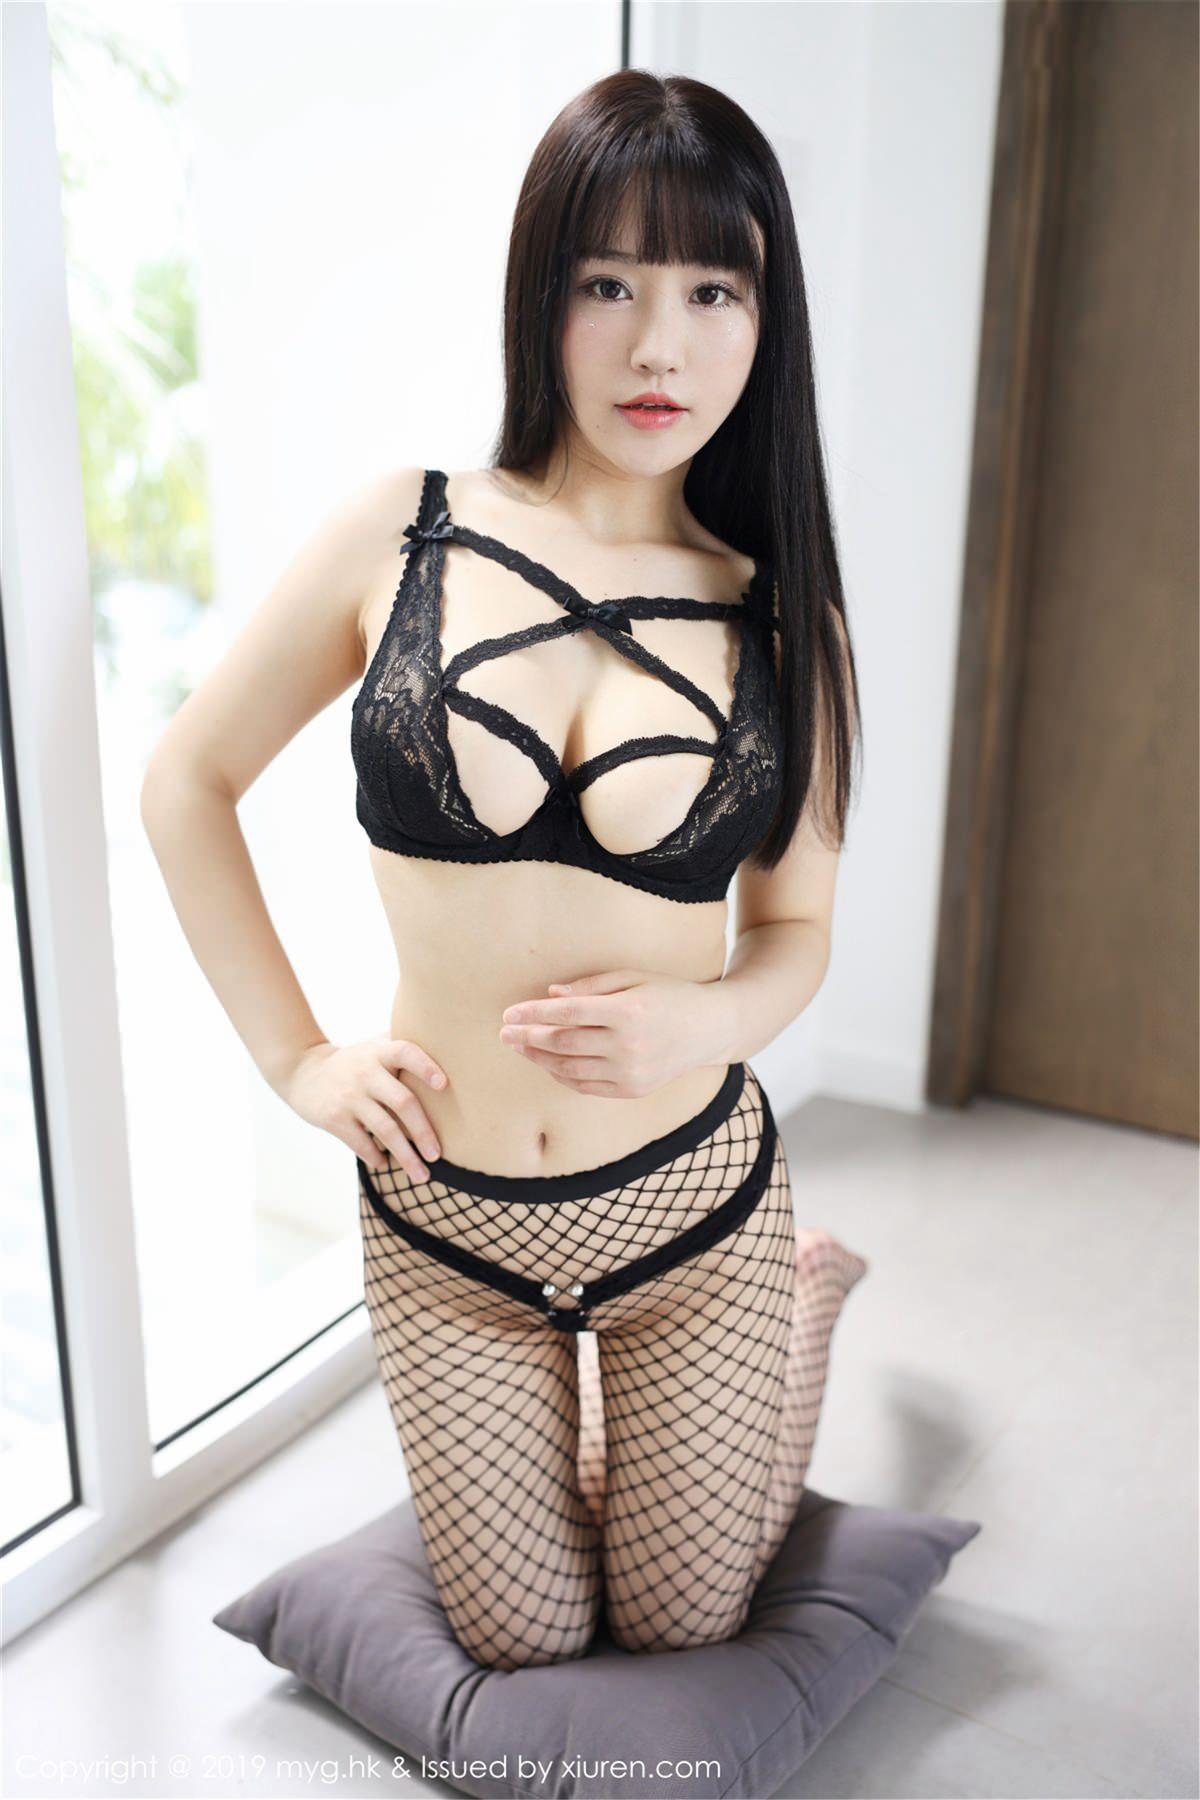 MyGirl Vol.357 13P, mygirl, Zhu Ke Er